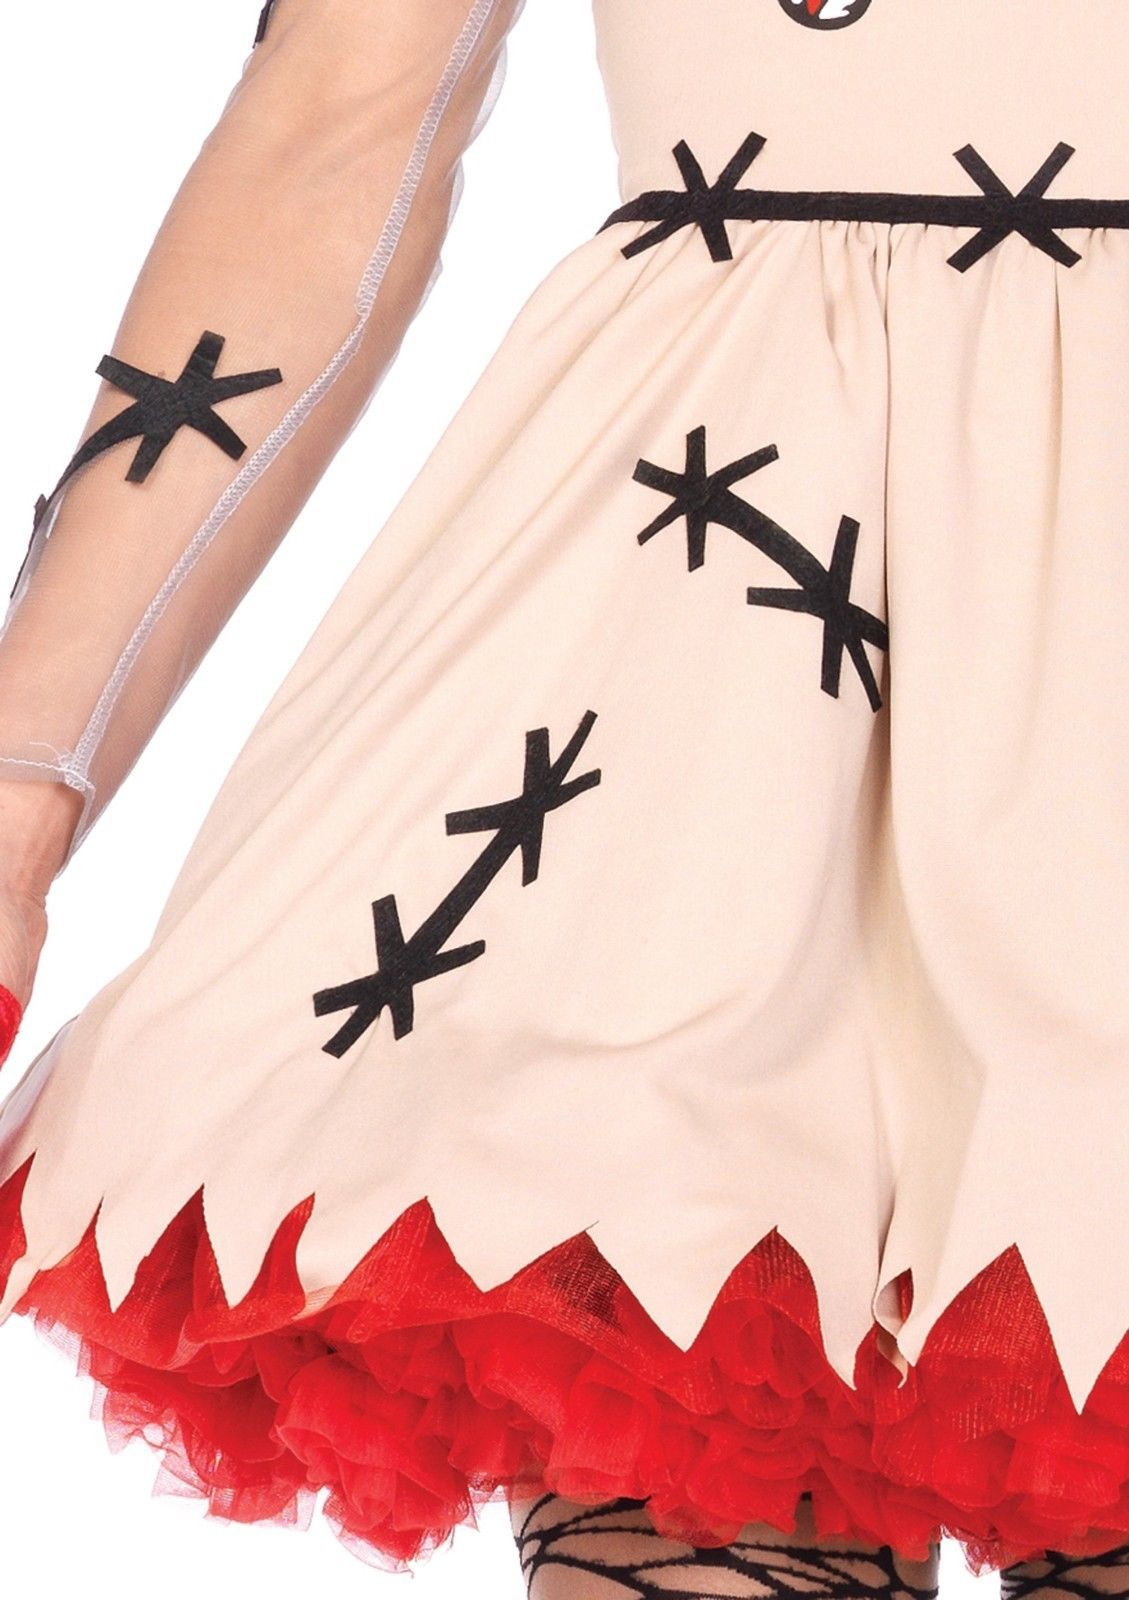 Leg Avenue Voodoo Cutie Dress Heart Adult Womens Halloween Costume 85434